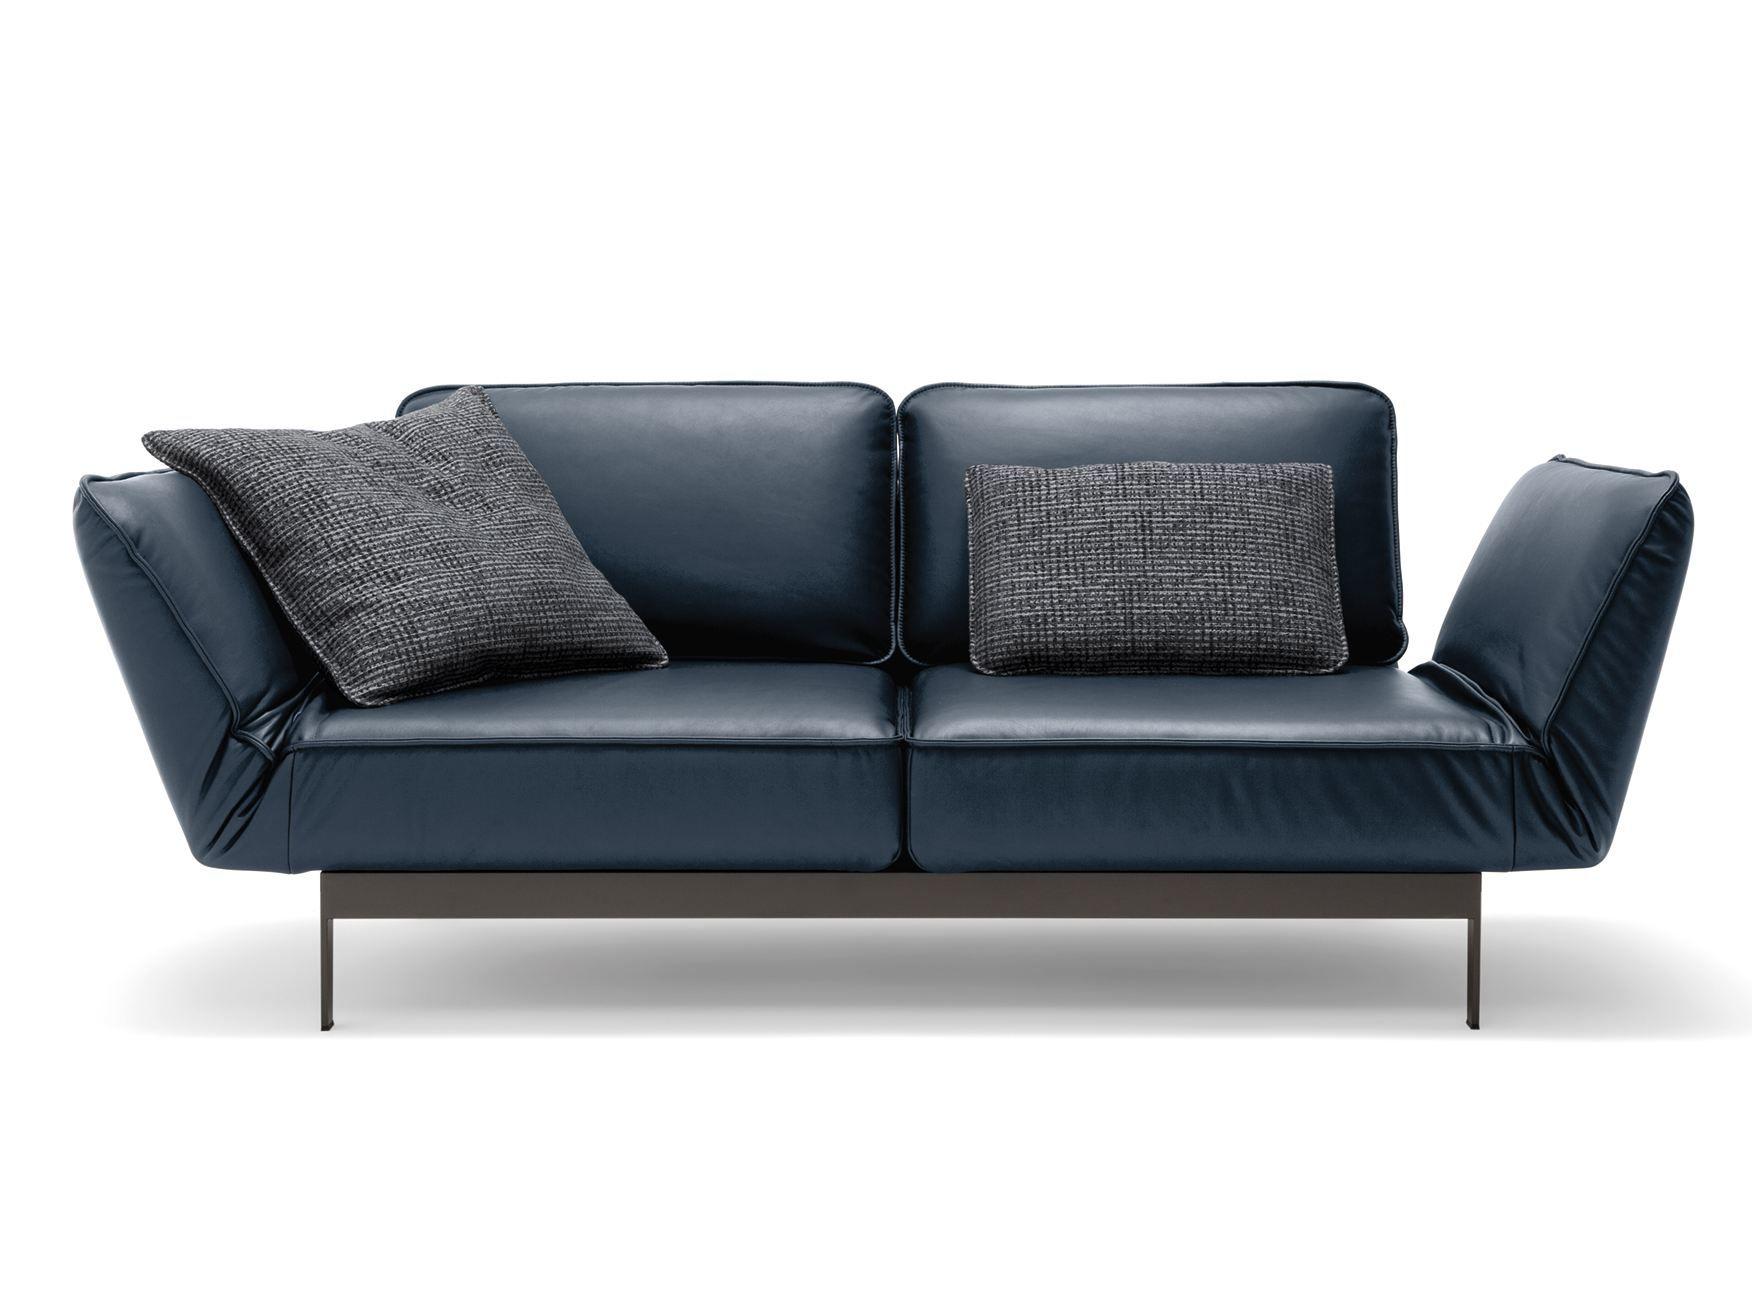 mera leather sofa mera collection by rolf benz design norbert beck. Black Bedroom Furniture Sets. Home Design Ideas